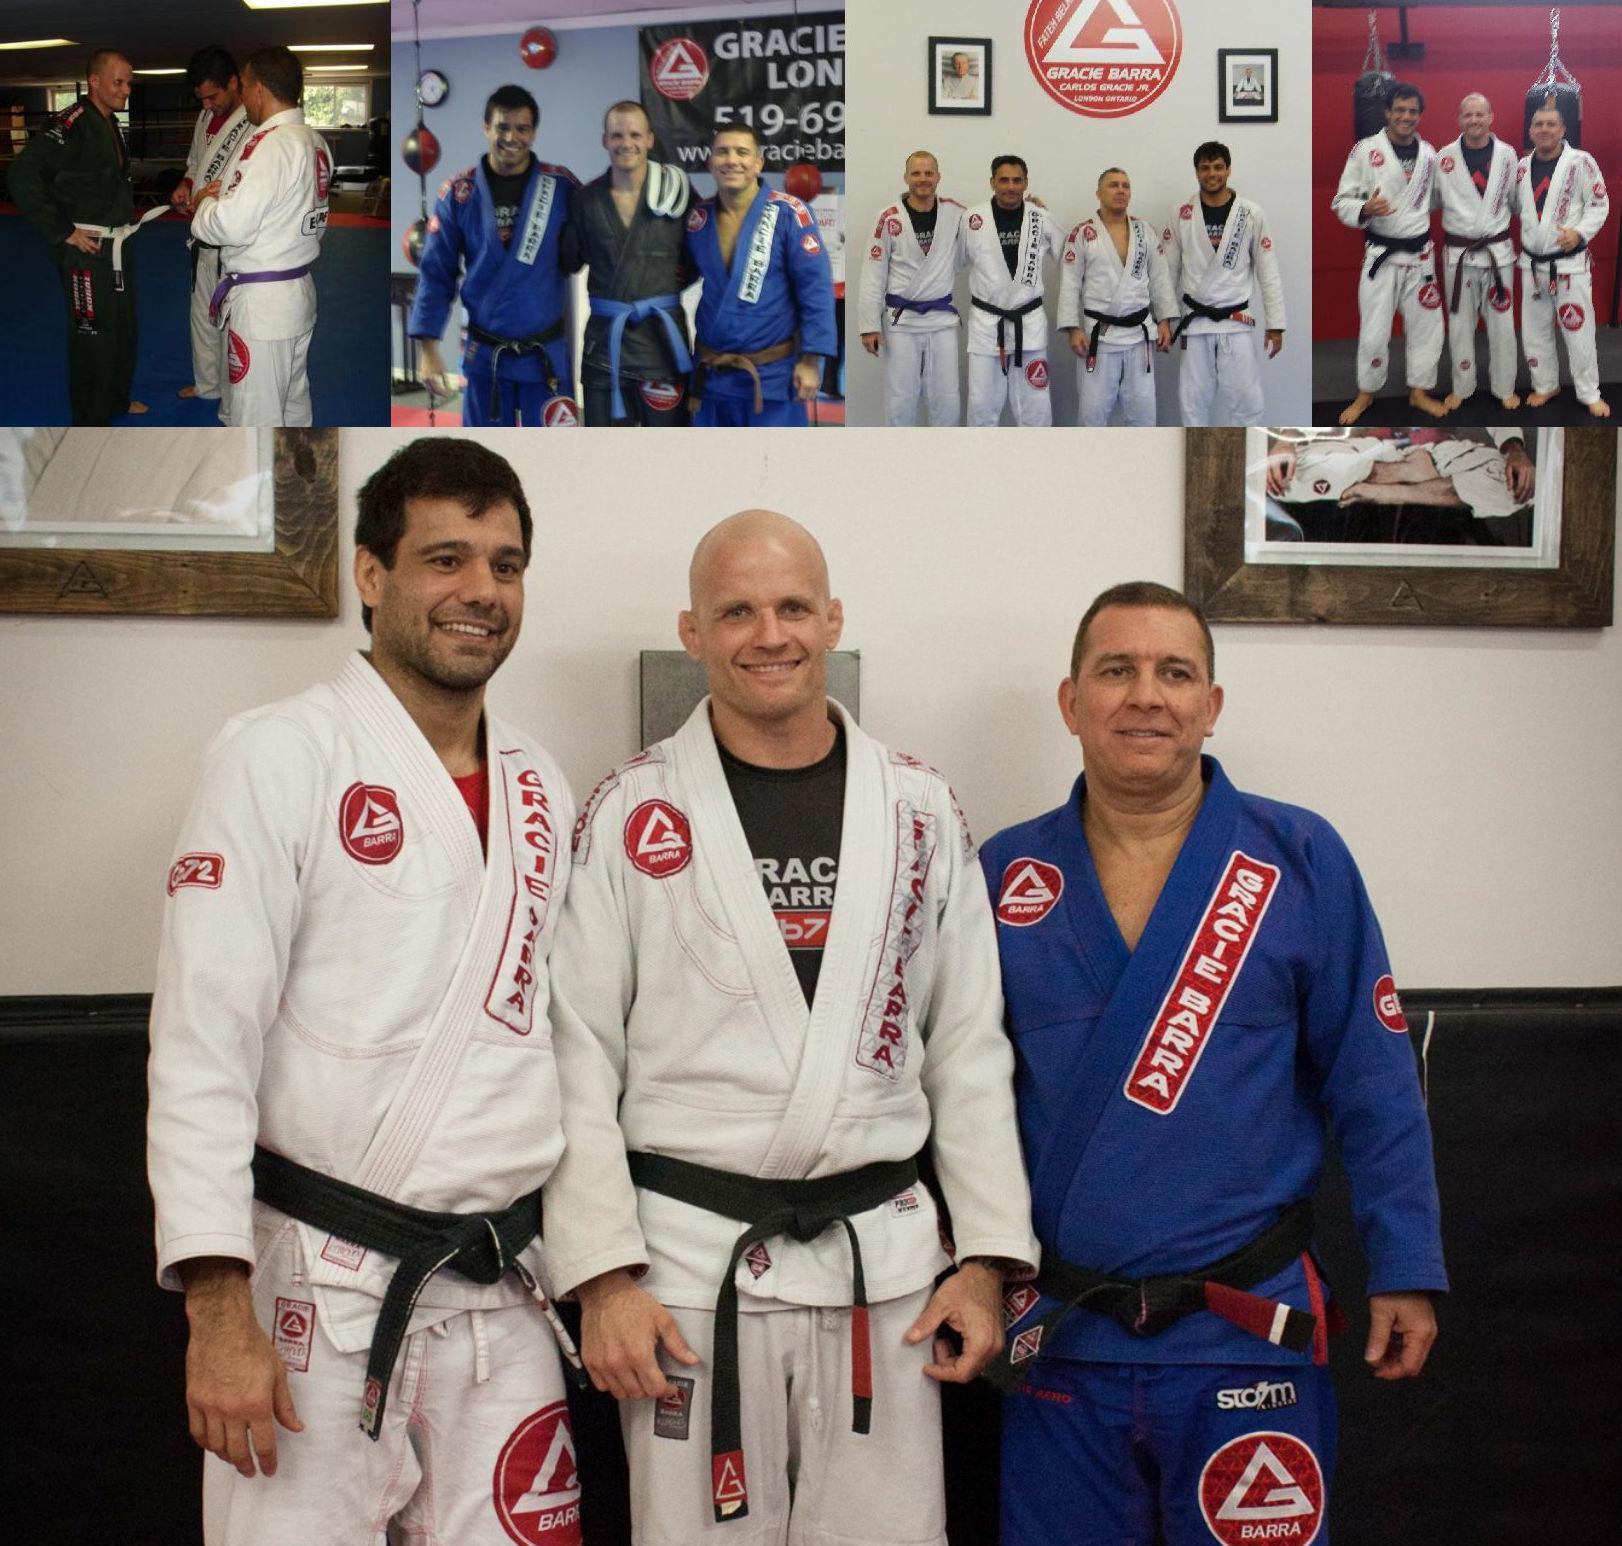 b41a9bd9e2f87 Gracie Armstrong Martial Arts Chatham Head Instructor Brazilian Jiu Jitsu  MMA Professor Thomas Armstrong Kids Youth